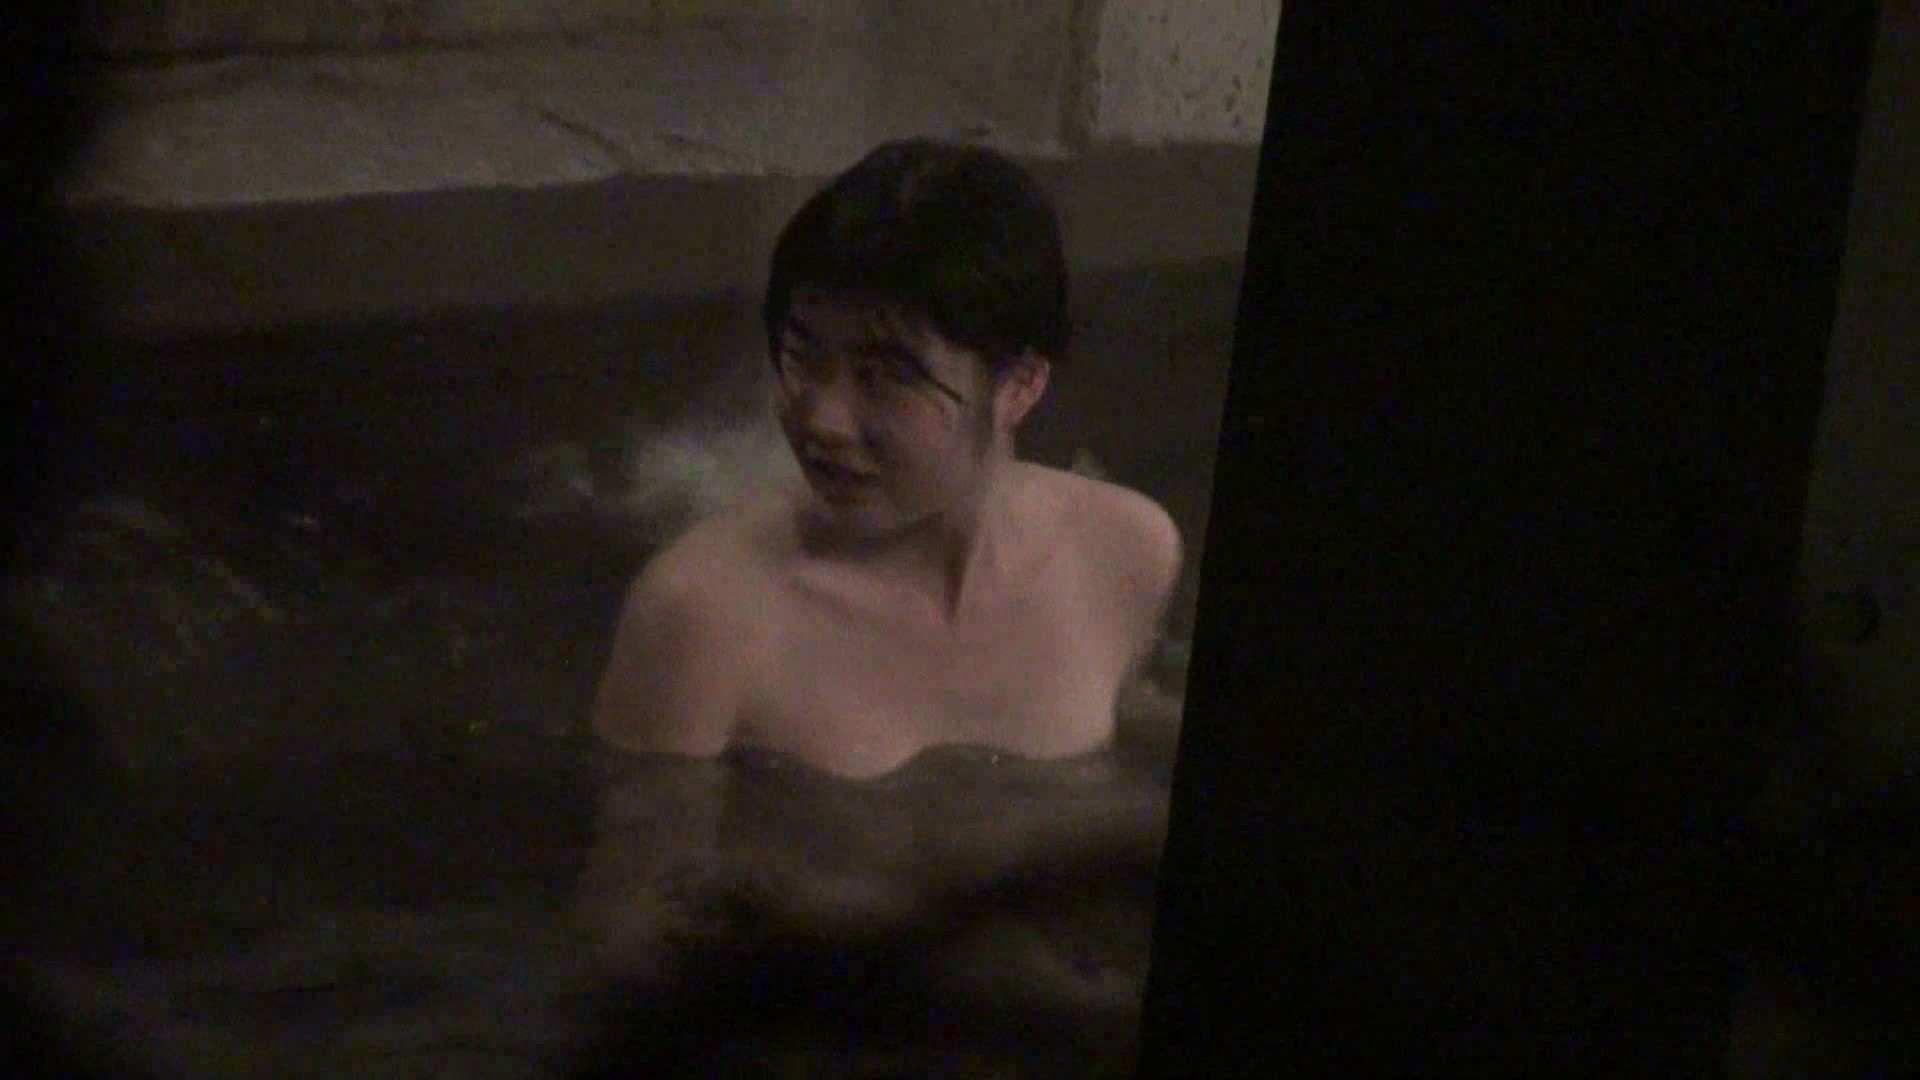 Aquaな露天風呂Vol.343 盗撮  92連発 66